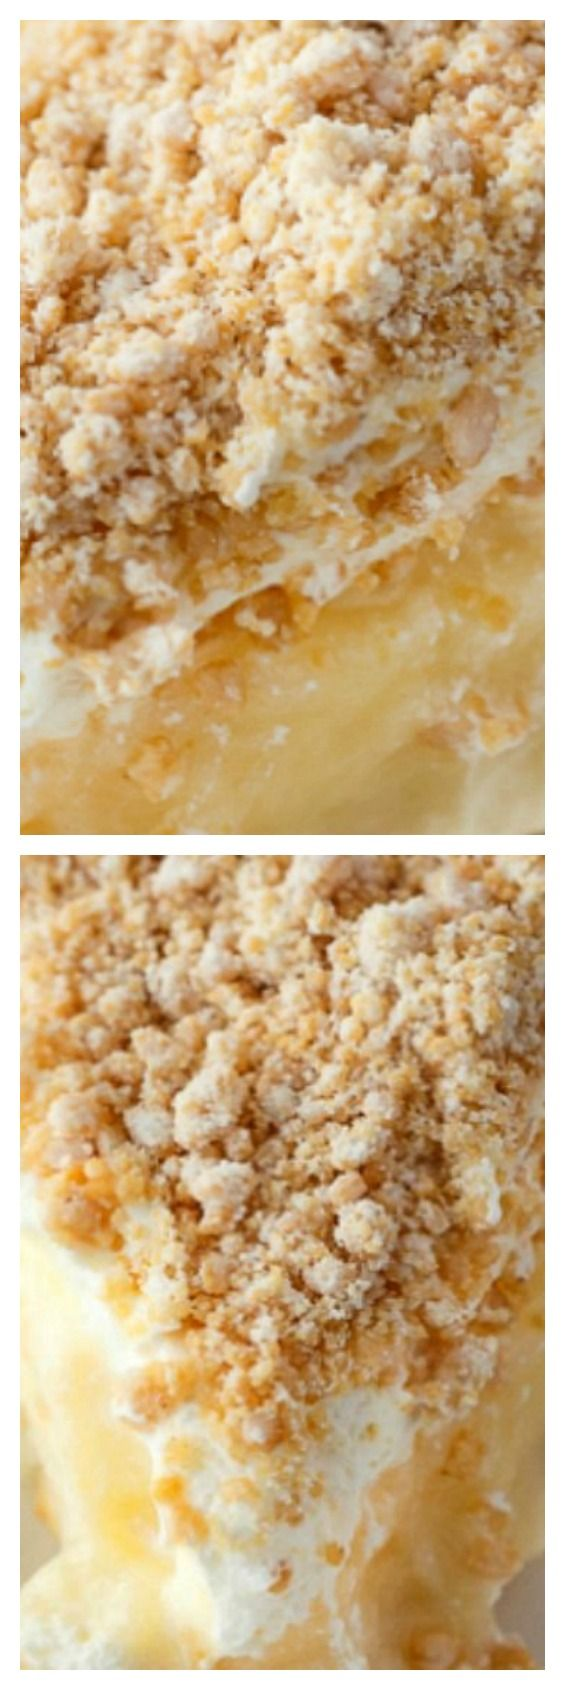 Peanut Butter Pie